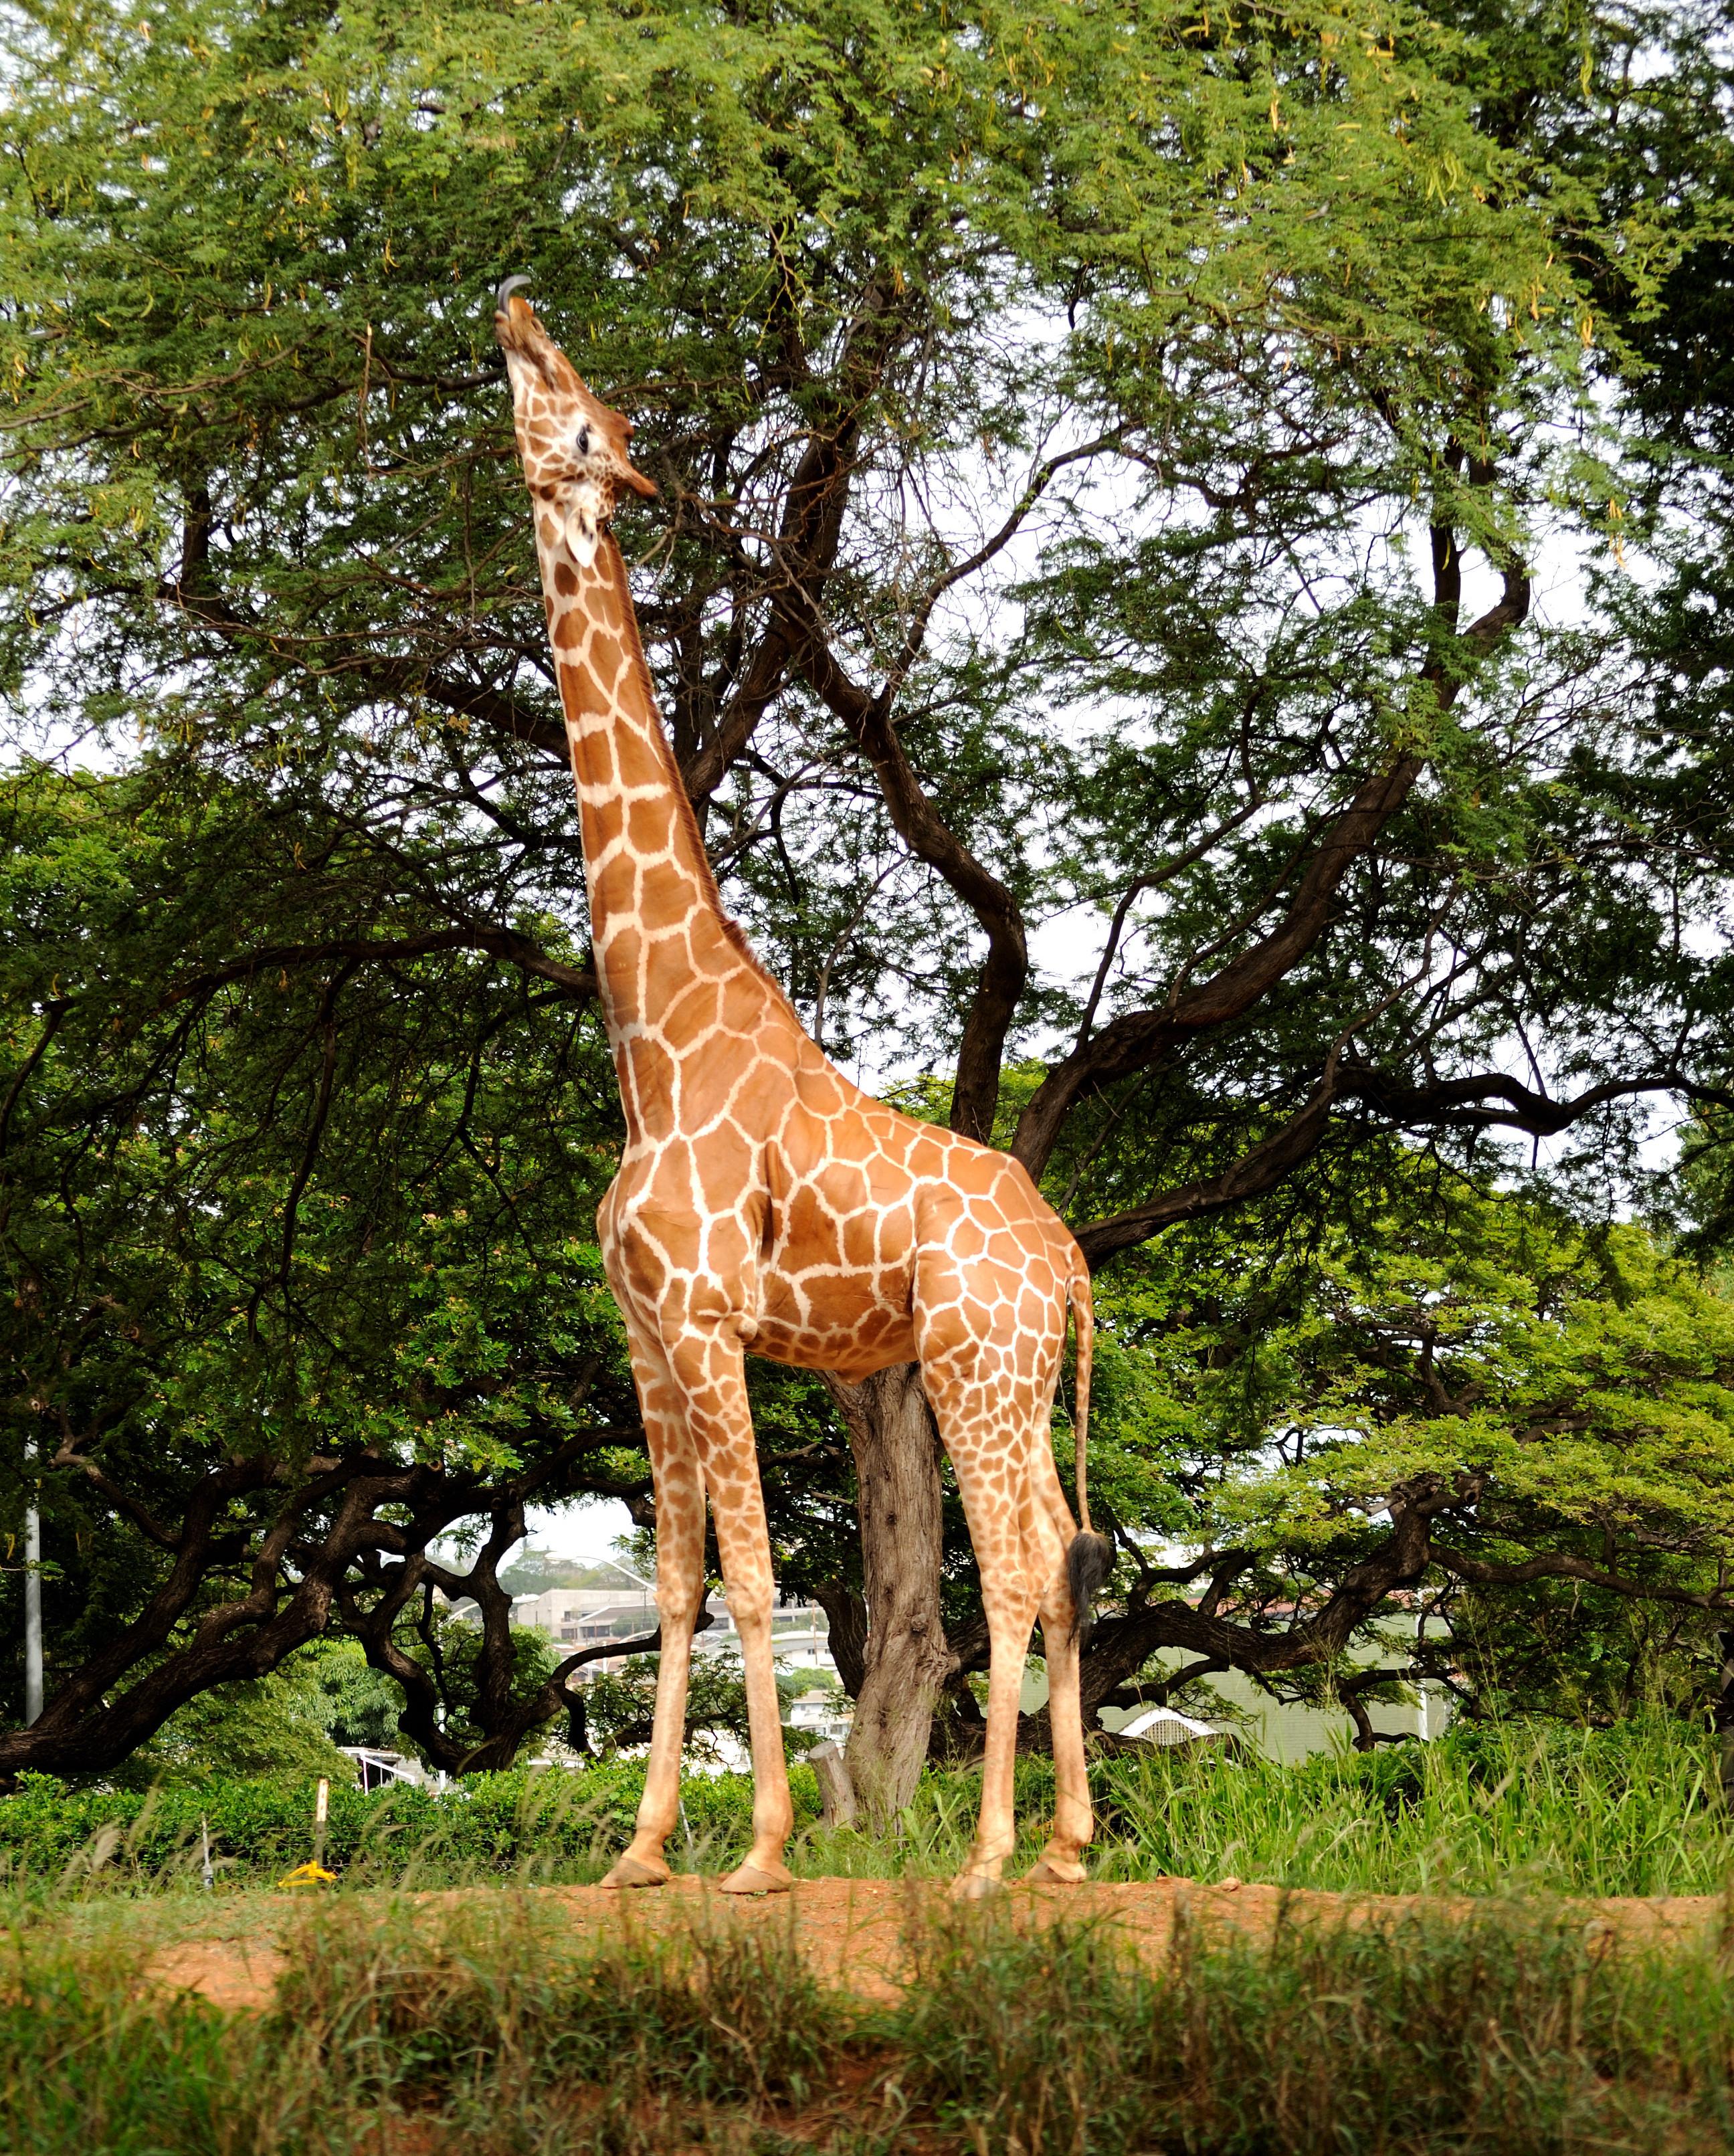 традиции жираф на дереве картинки для сосешь